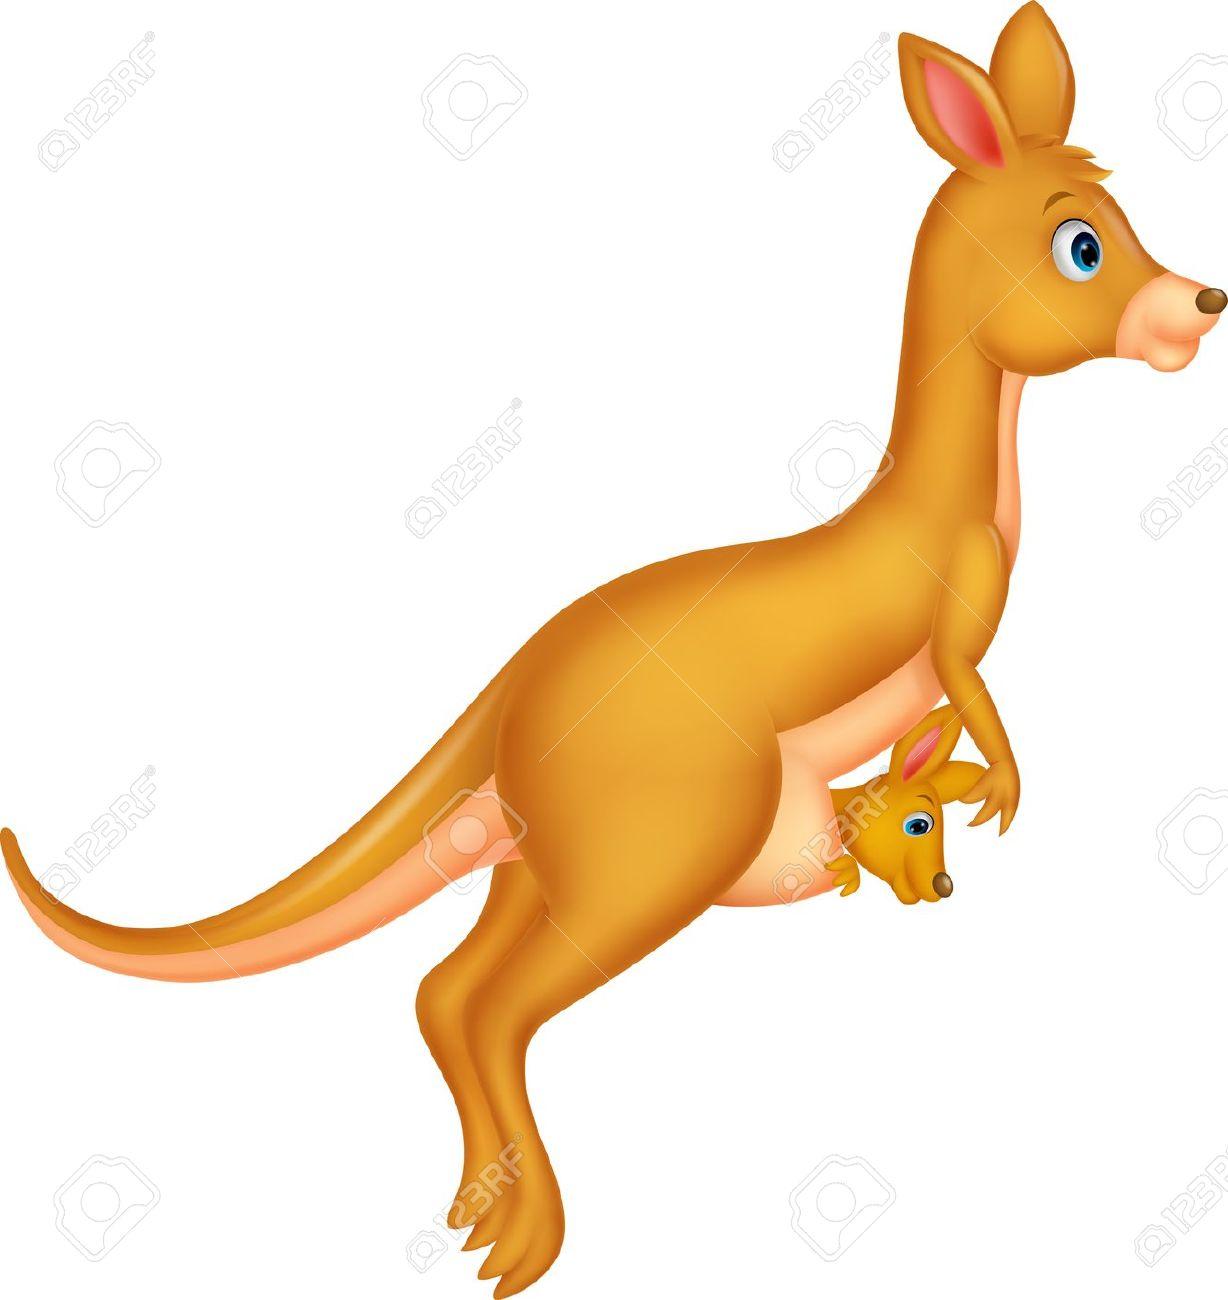 Kangaroo cliparts